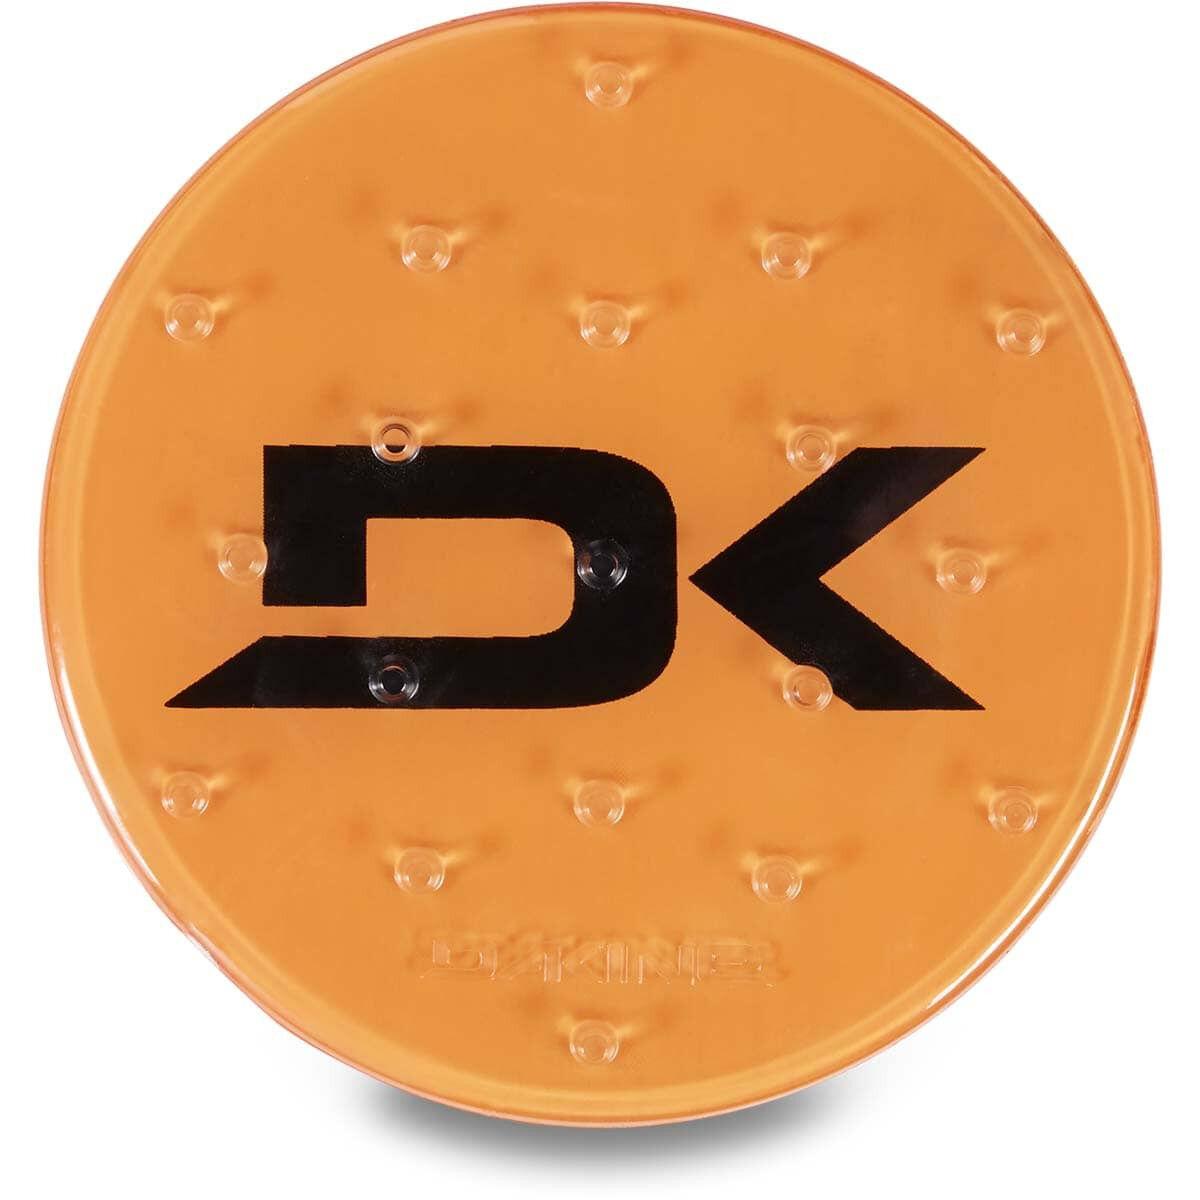 Dakine Circle Mat Snowboard Traction Pad Golden Glow